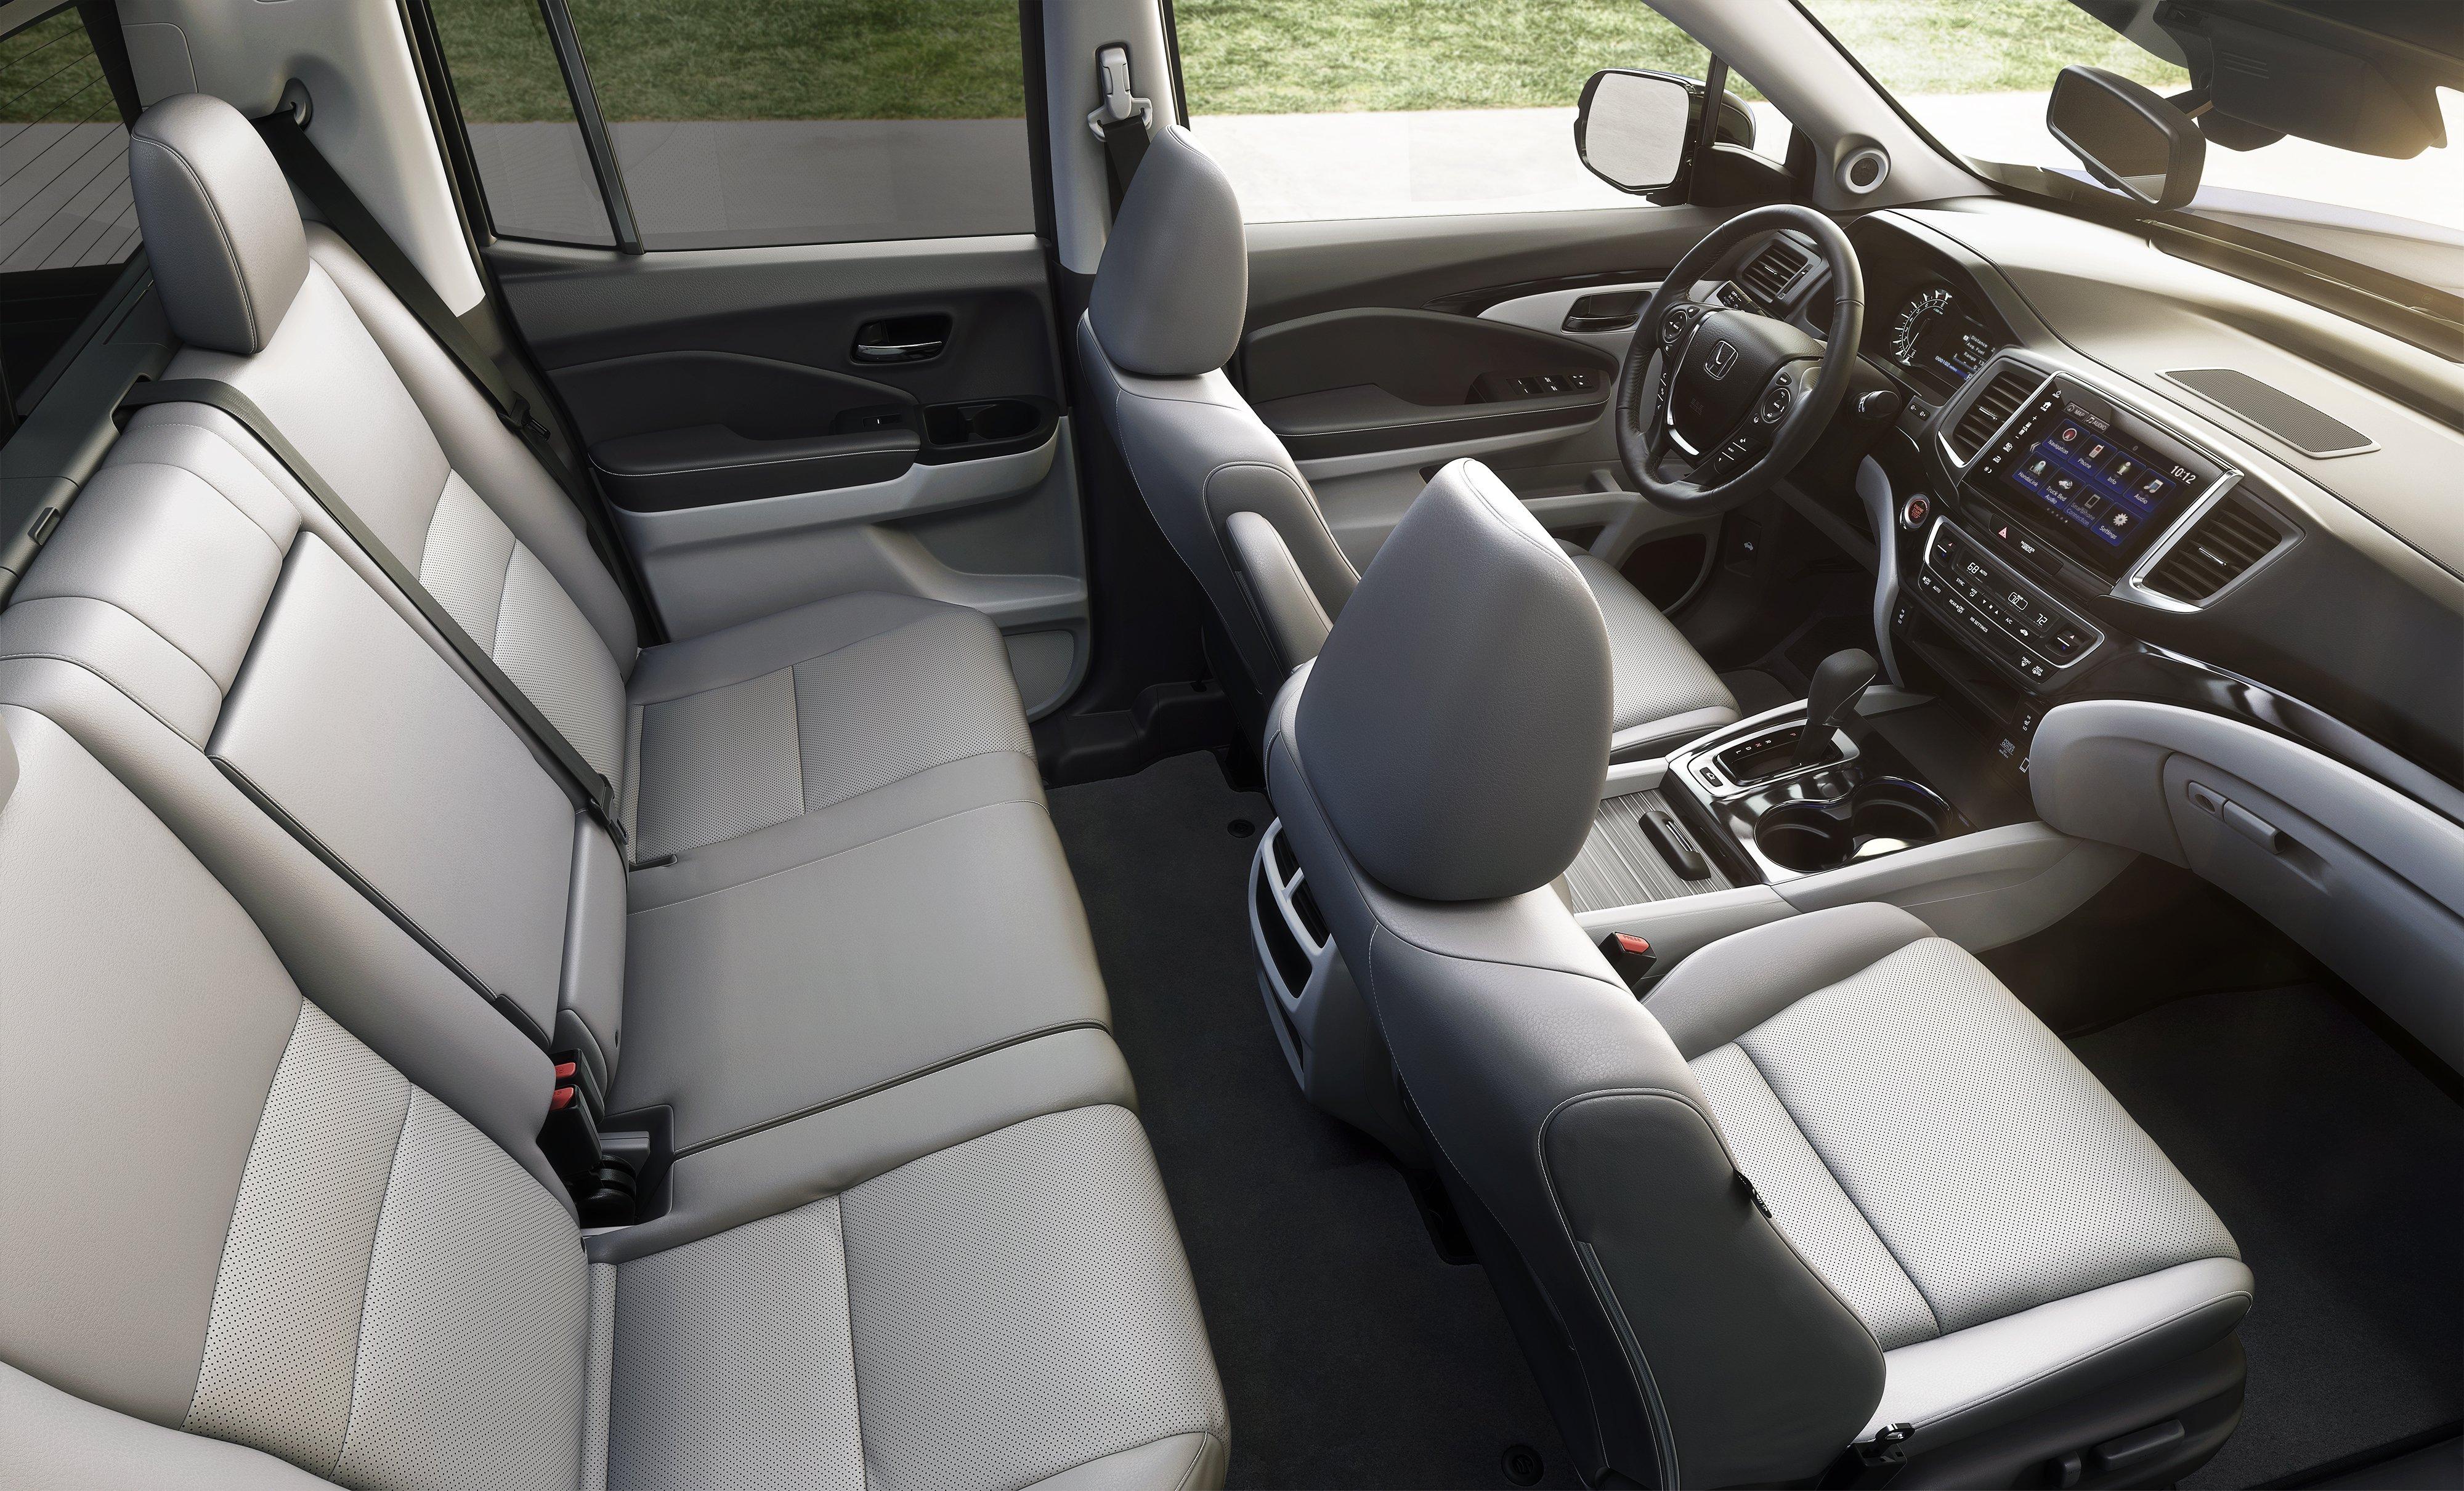 2017 Honda Ridgeline White Interior